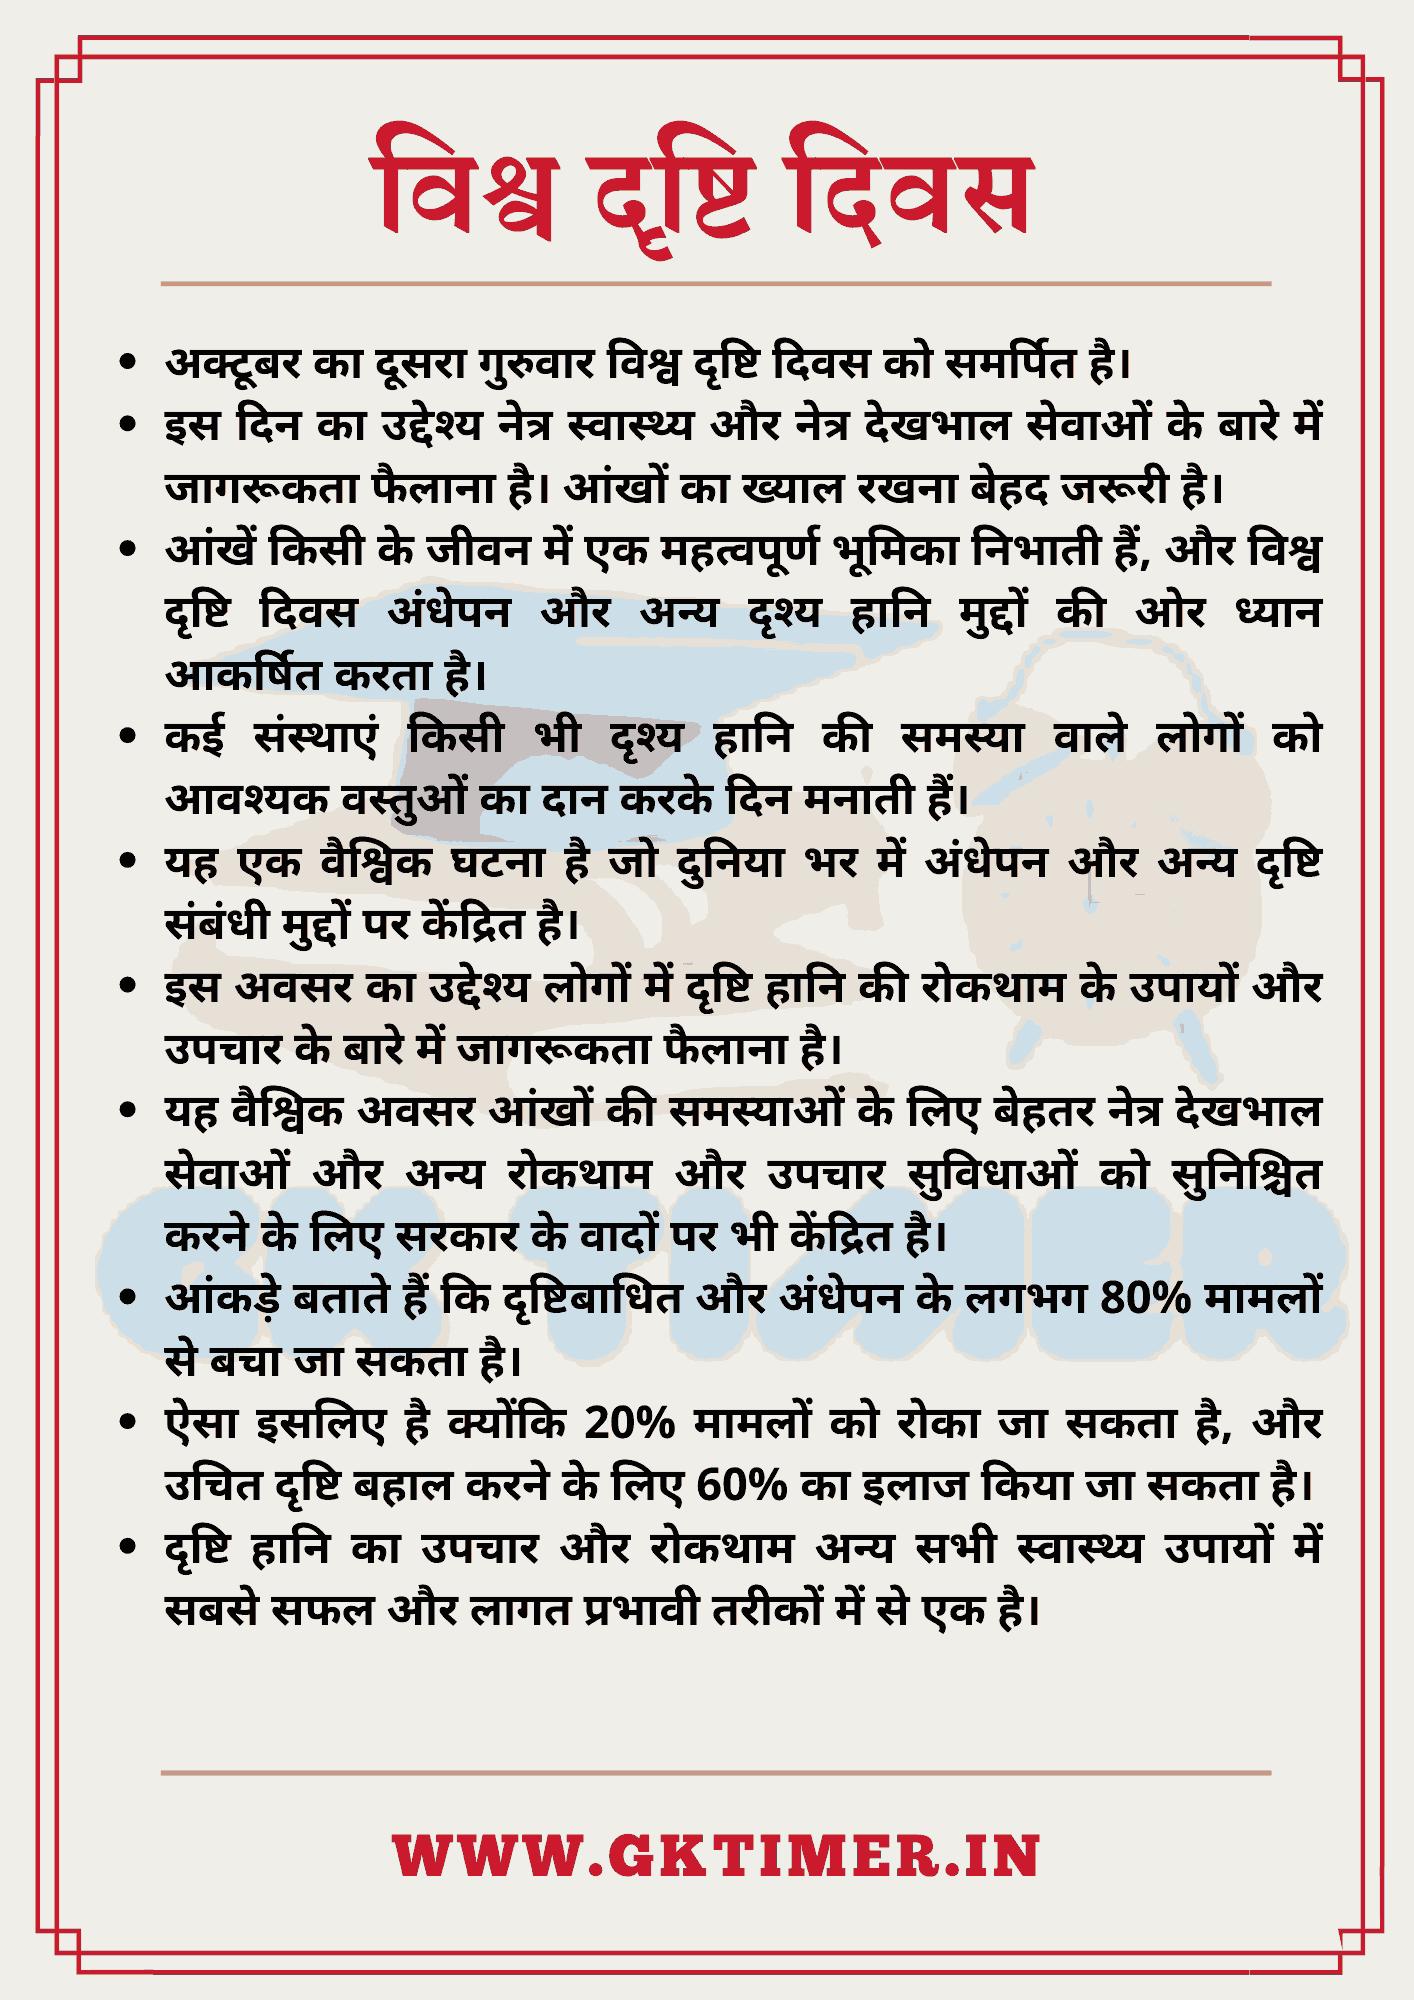 विश्व दृष्टि दिवस पर निबंध    Essay on World Sight Day in Hindi    10 Lines  on World Sight Day in Hindi